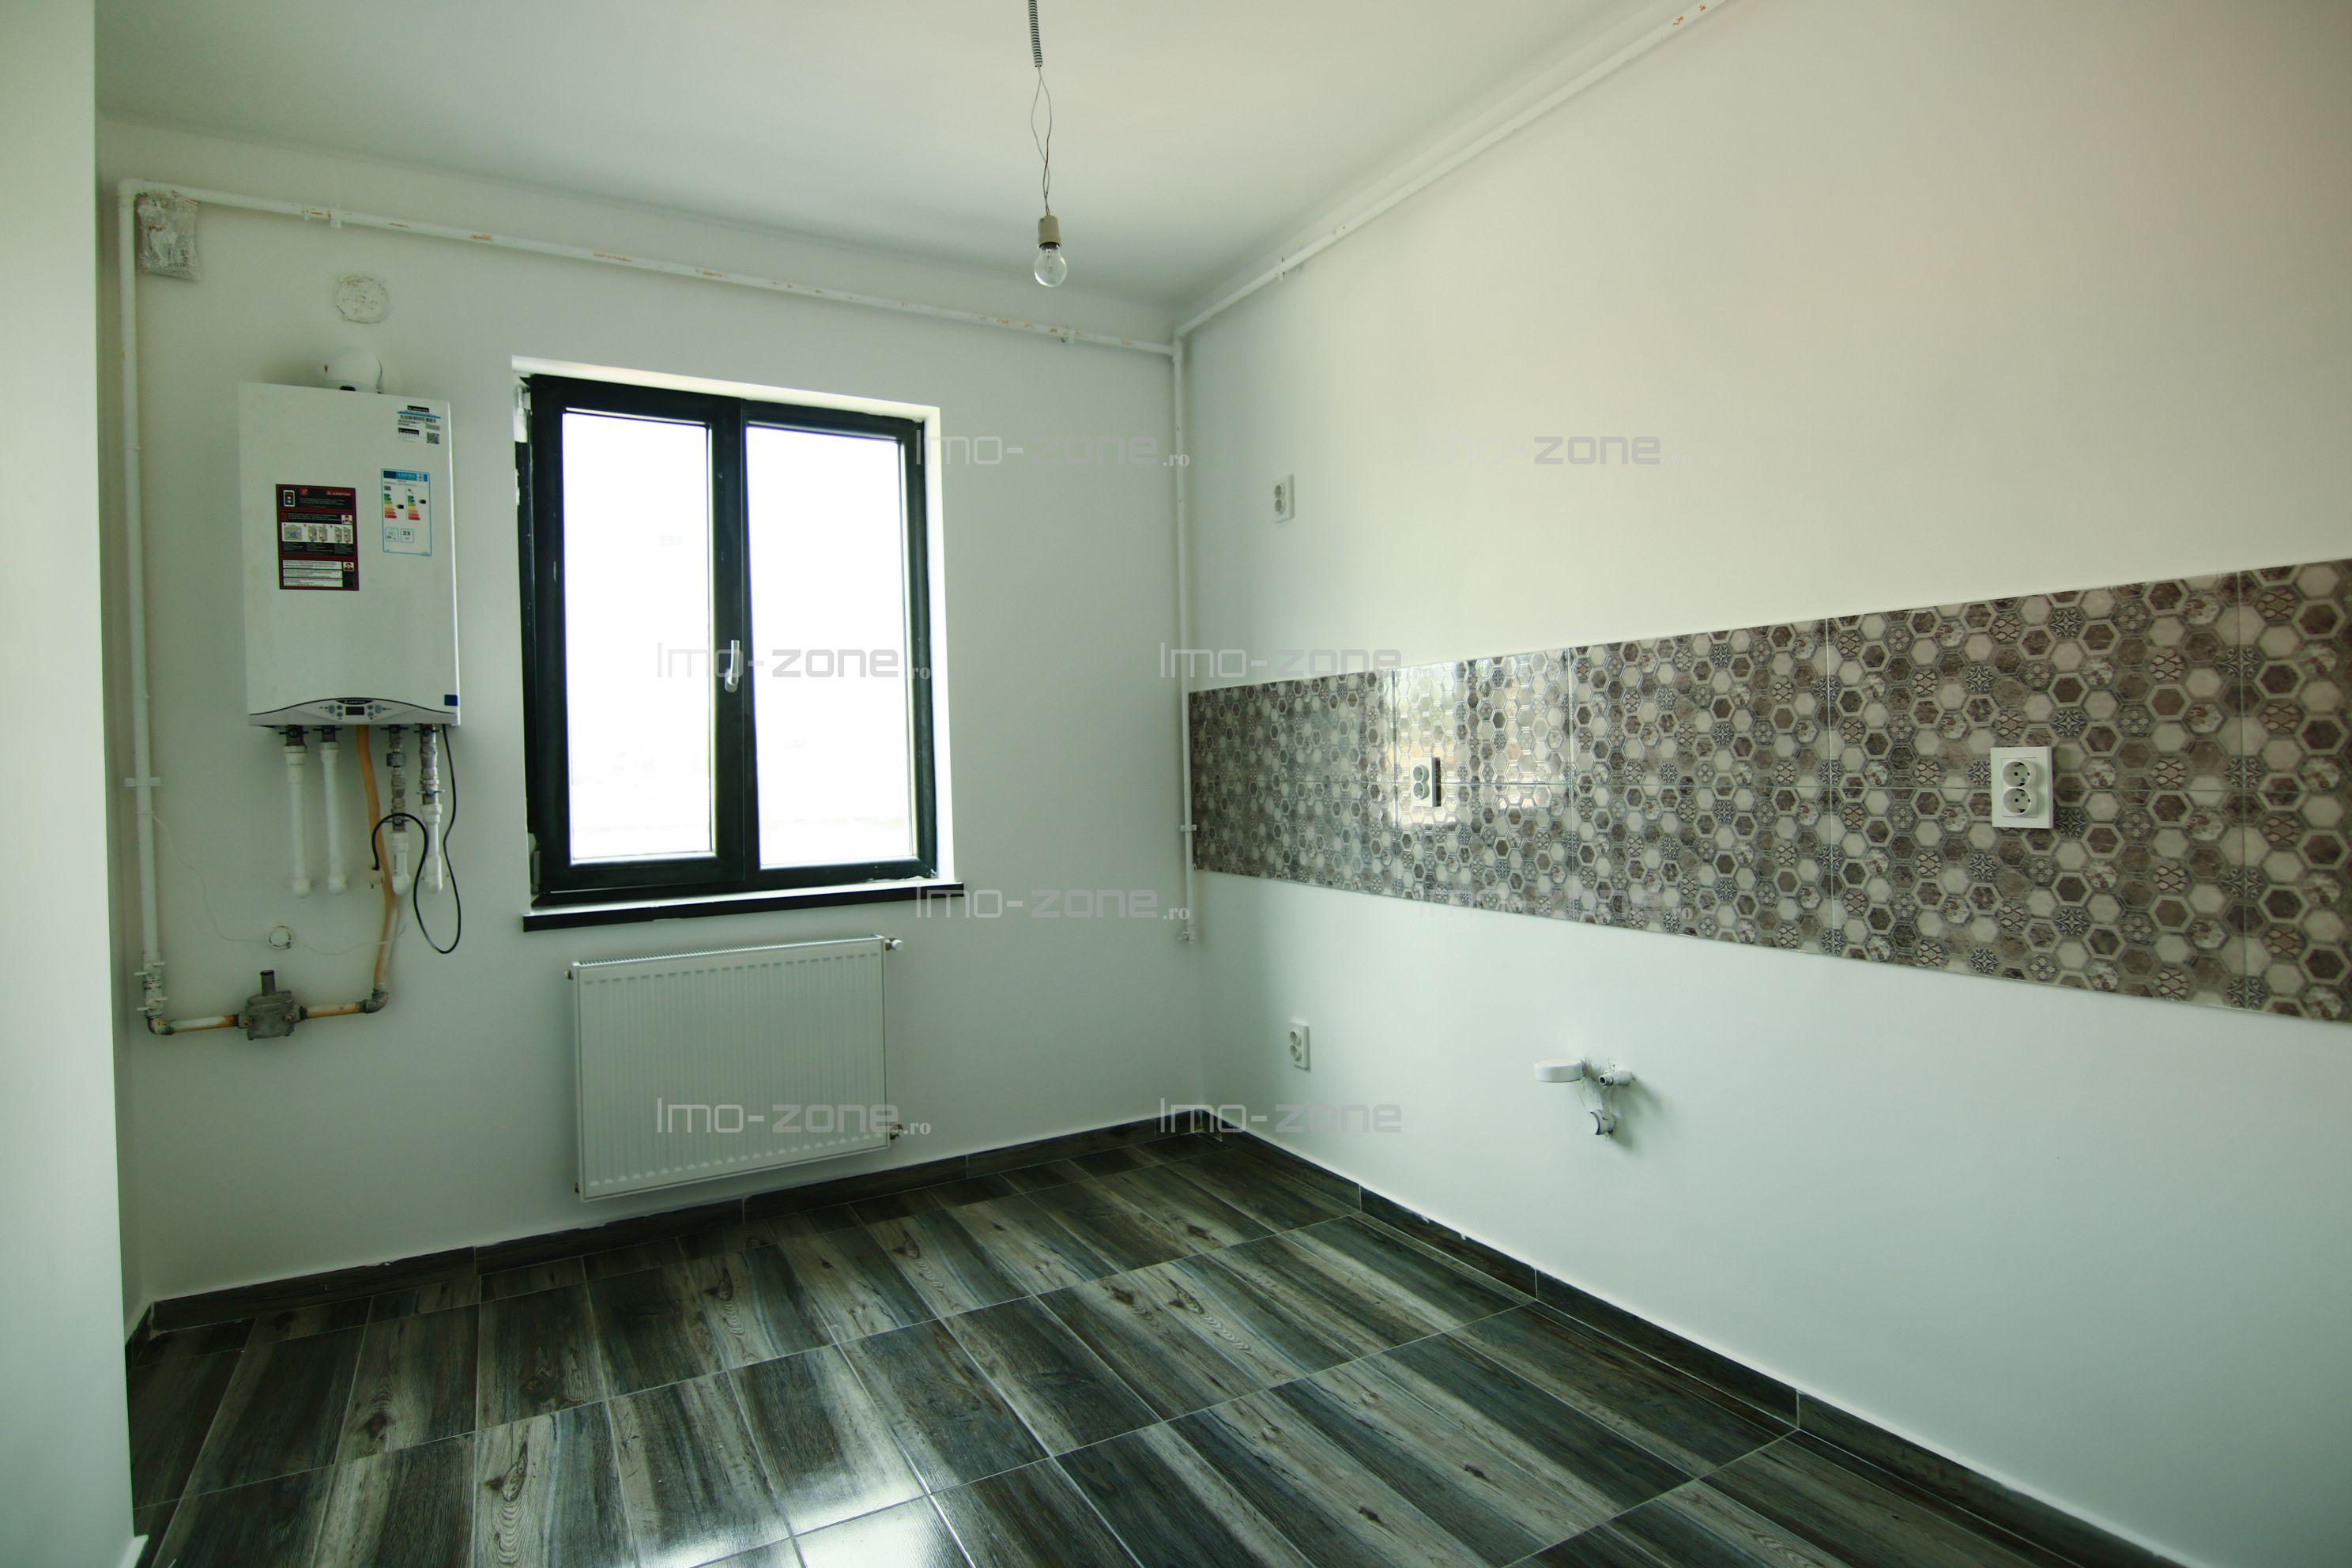 Apartament cu 2 camere, 58mp, langa metrou Pacii, FINISAT LA CHEIE,  COMISION 0%